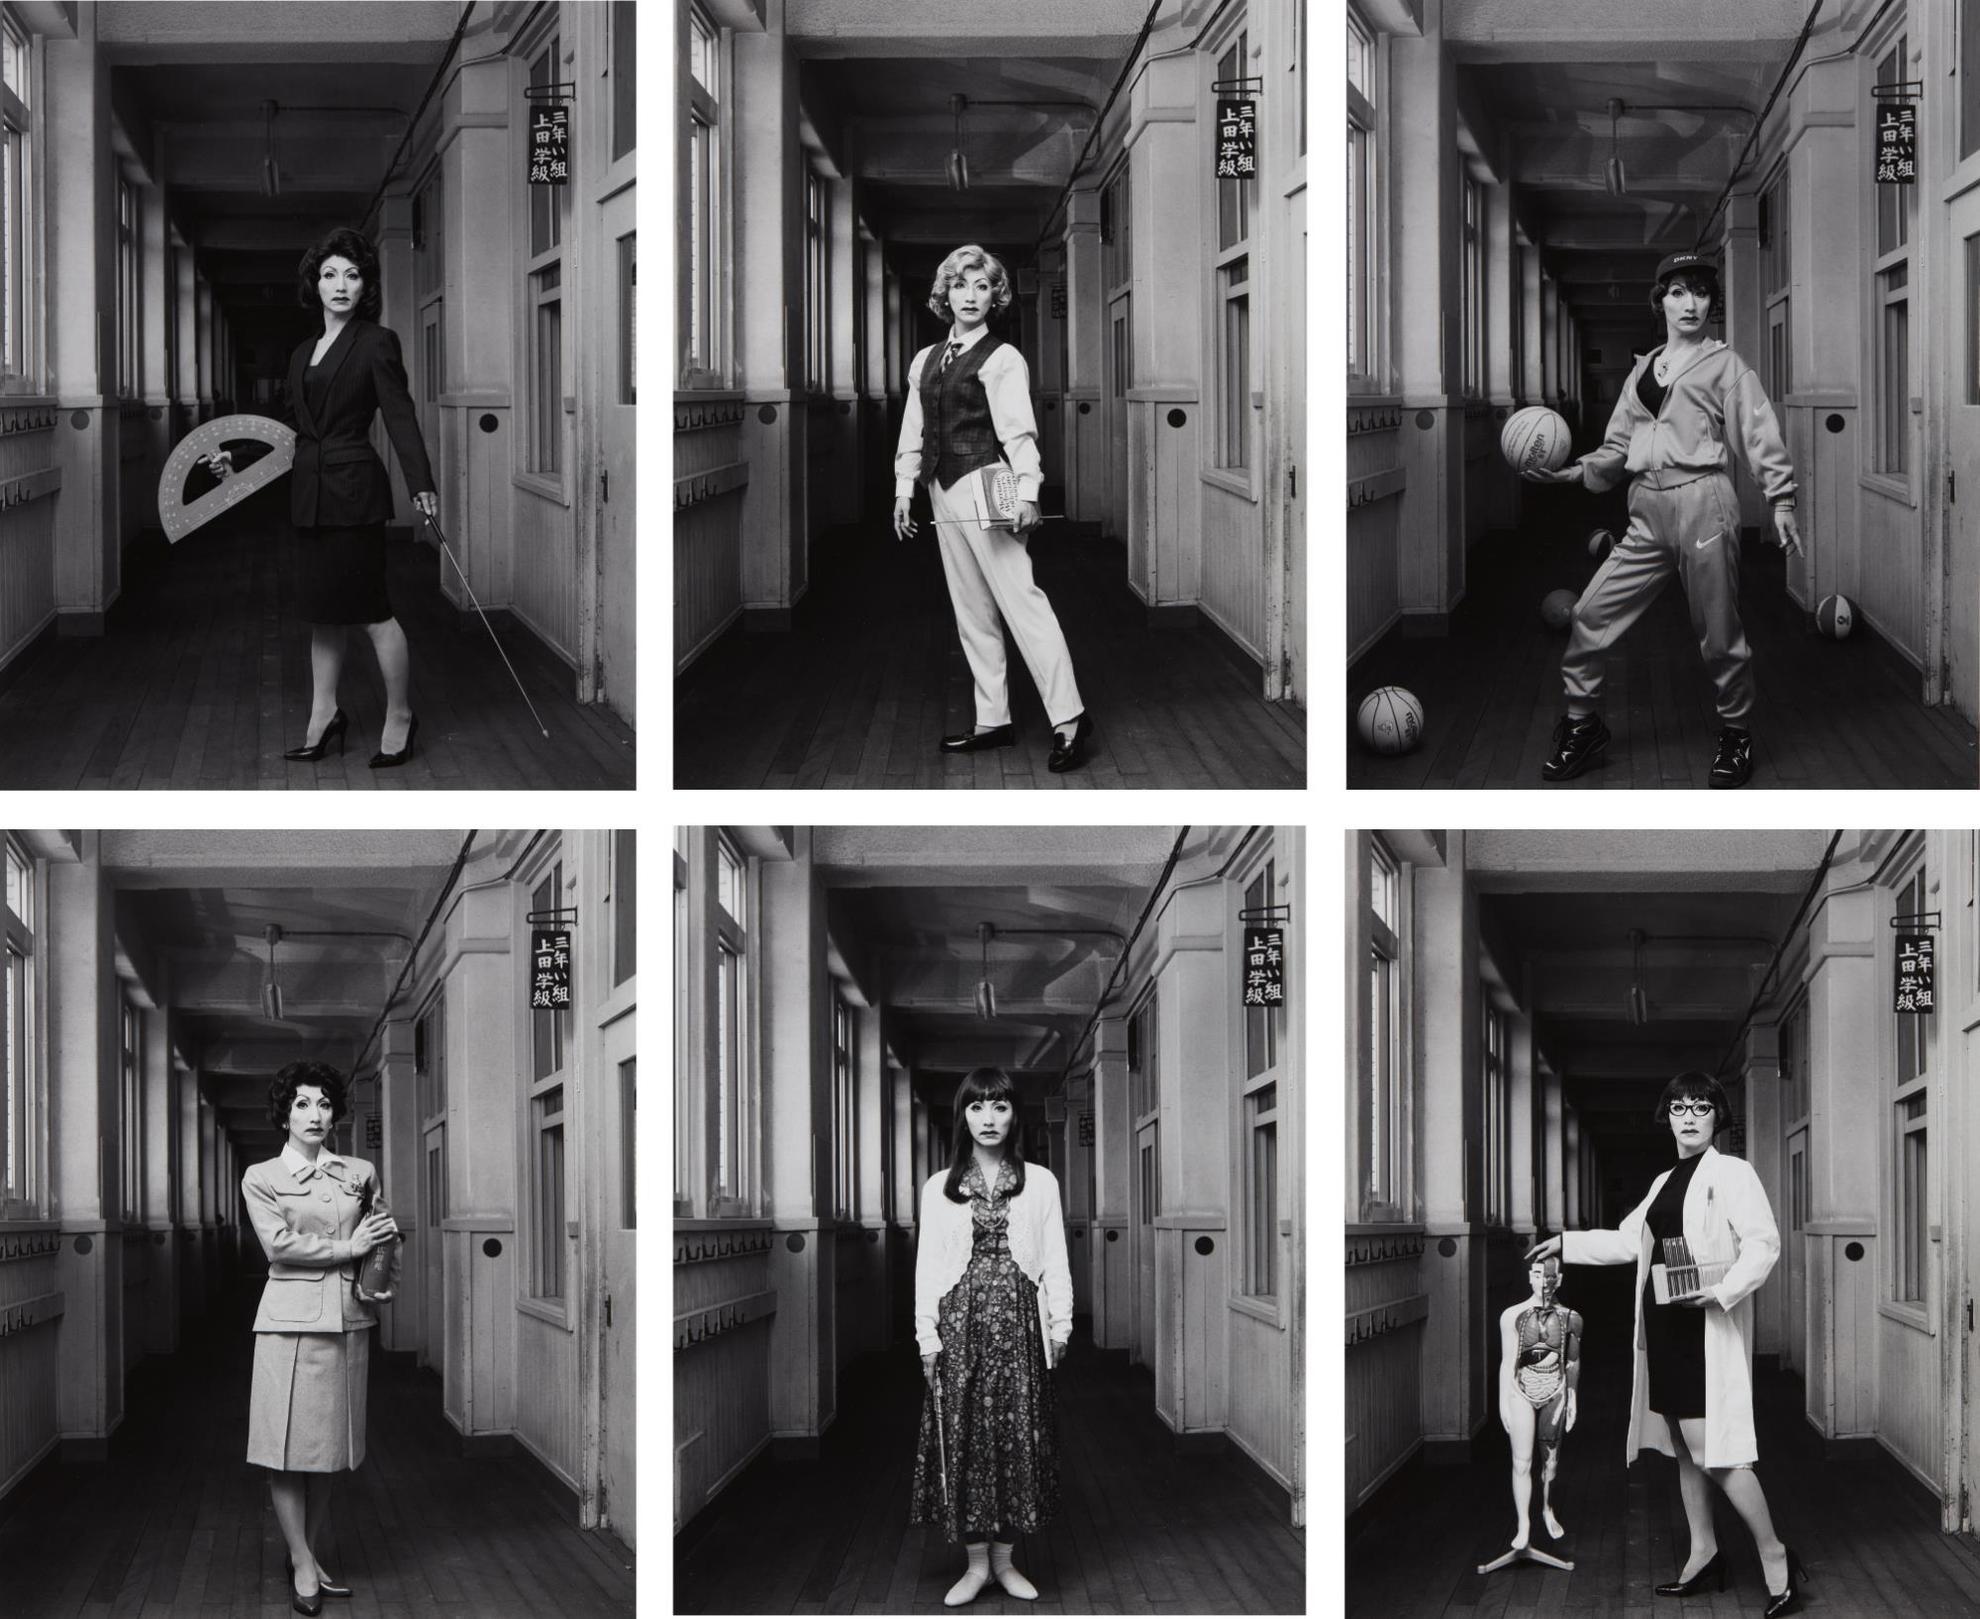 Yasumasa Morimura-Selected Images From School Teacher-1996